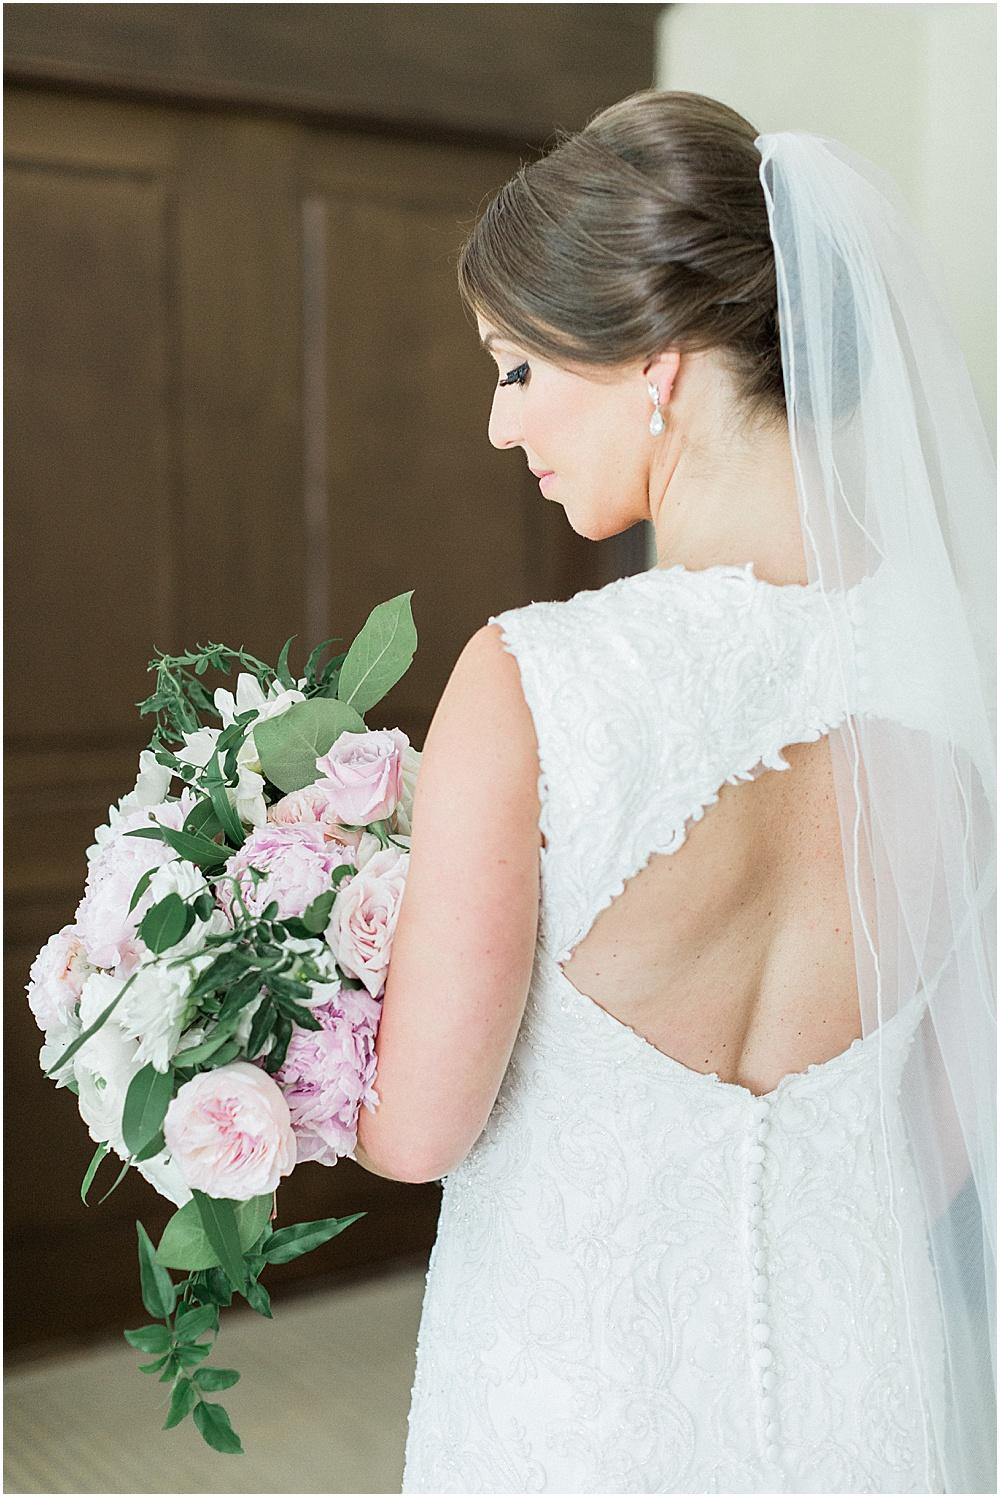 willowbend_country_club_colleen_brett_wild_dahlia_cw_events_cape_cod_massachusetts_boston_wedding_photographer_meredith_jane_photography_photo_0614.jpg